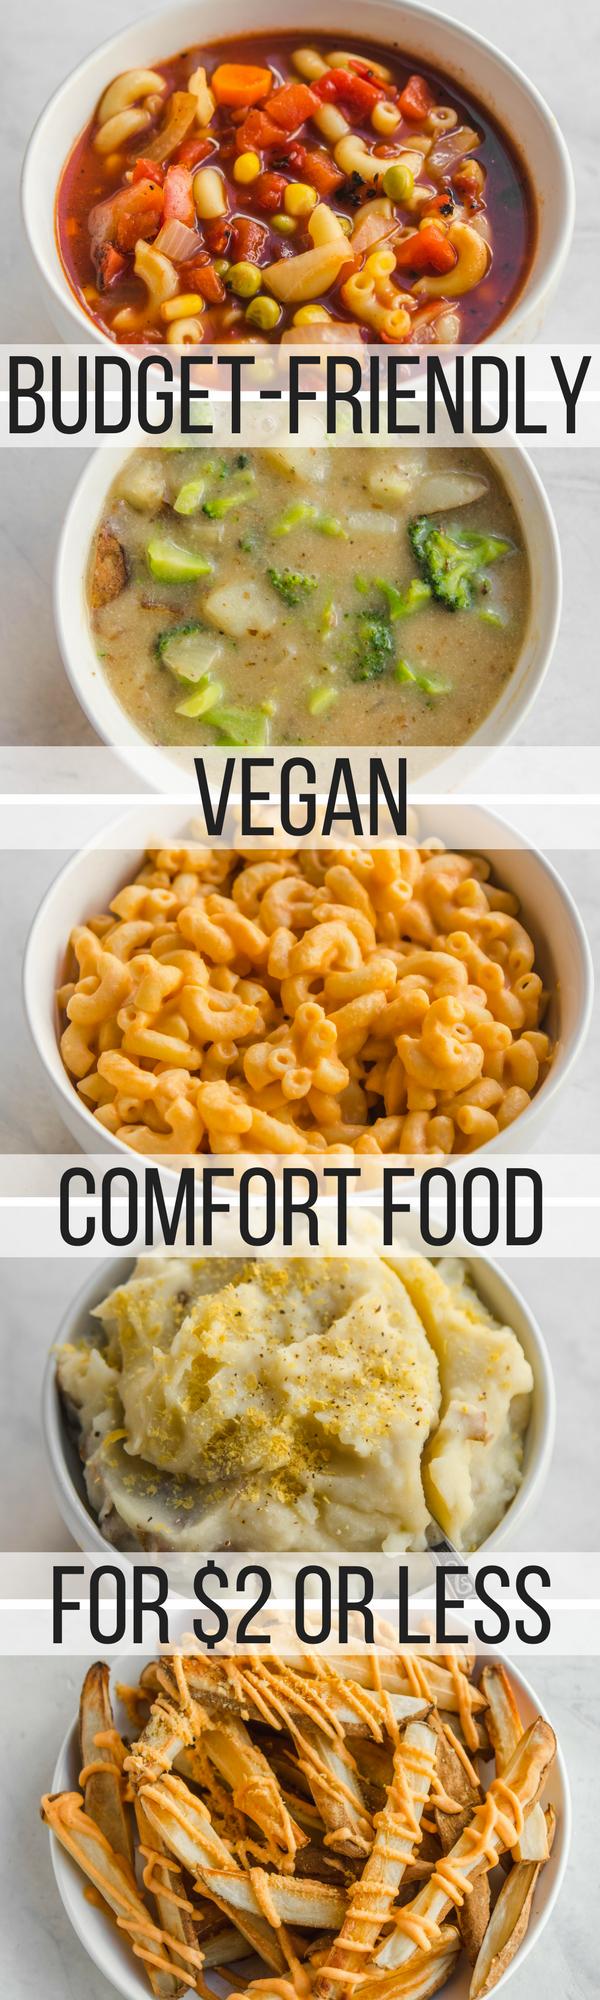 5 budget friendly vegan comfort food recipes under 2 from my bowl vegan budget friendly vegan comfort food recipes under 2 per serving vegan forumfinder Gallery